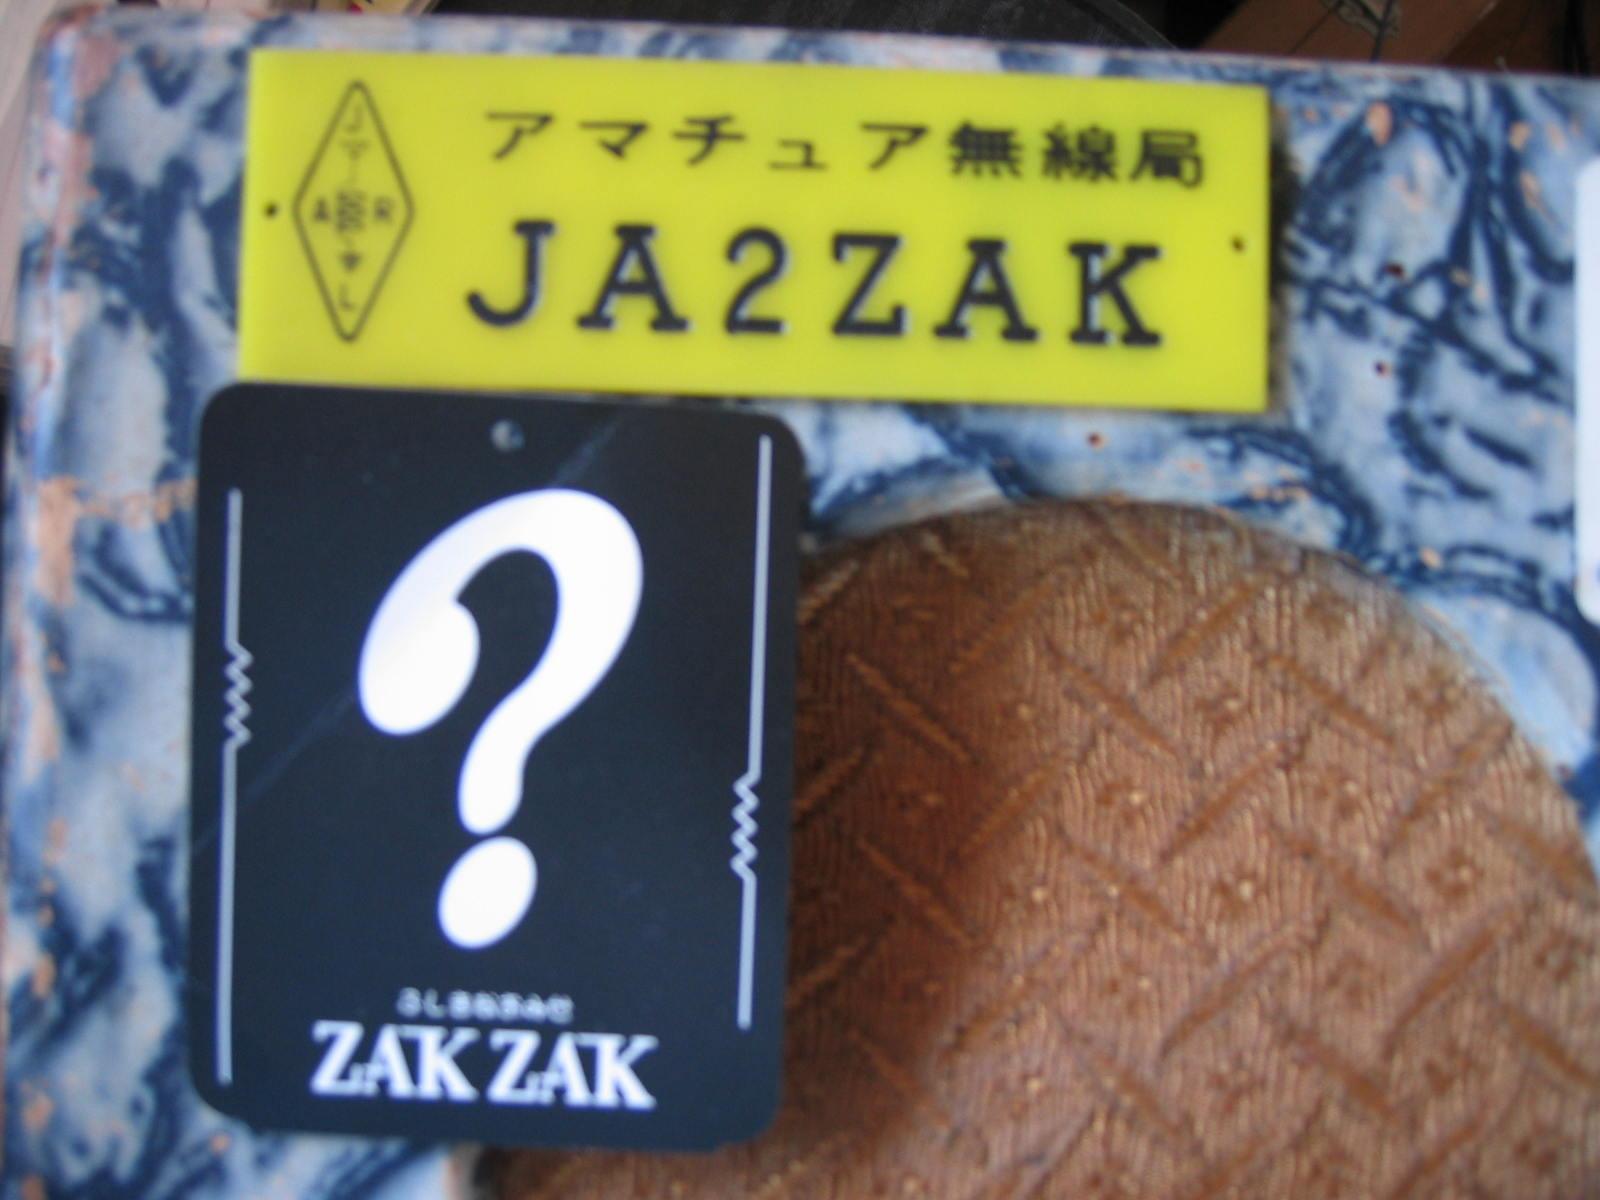 Ja2zak